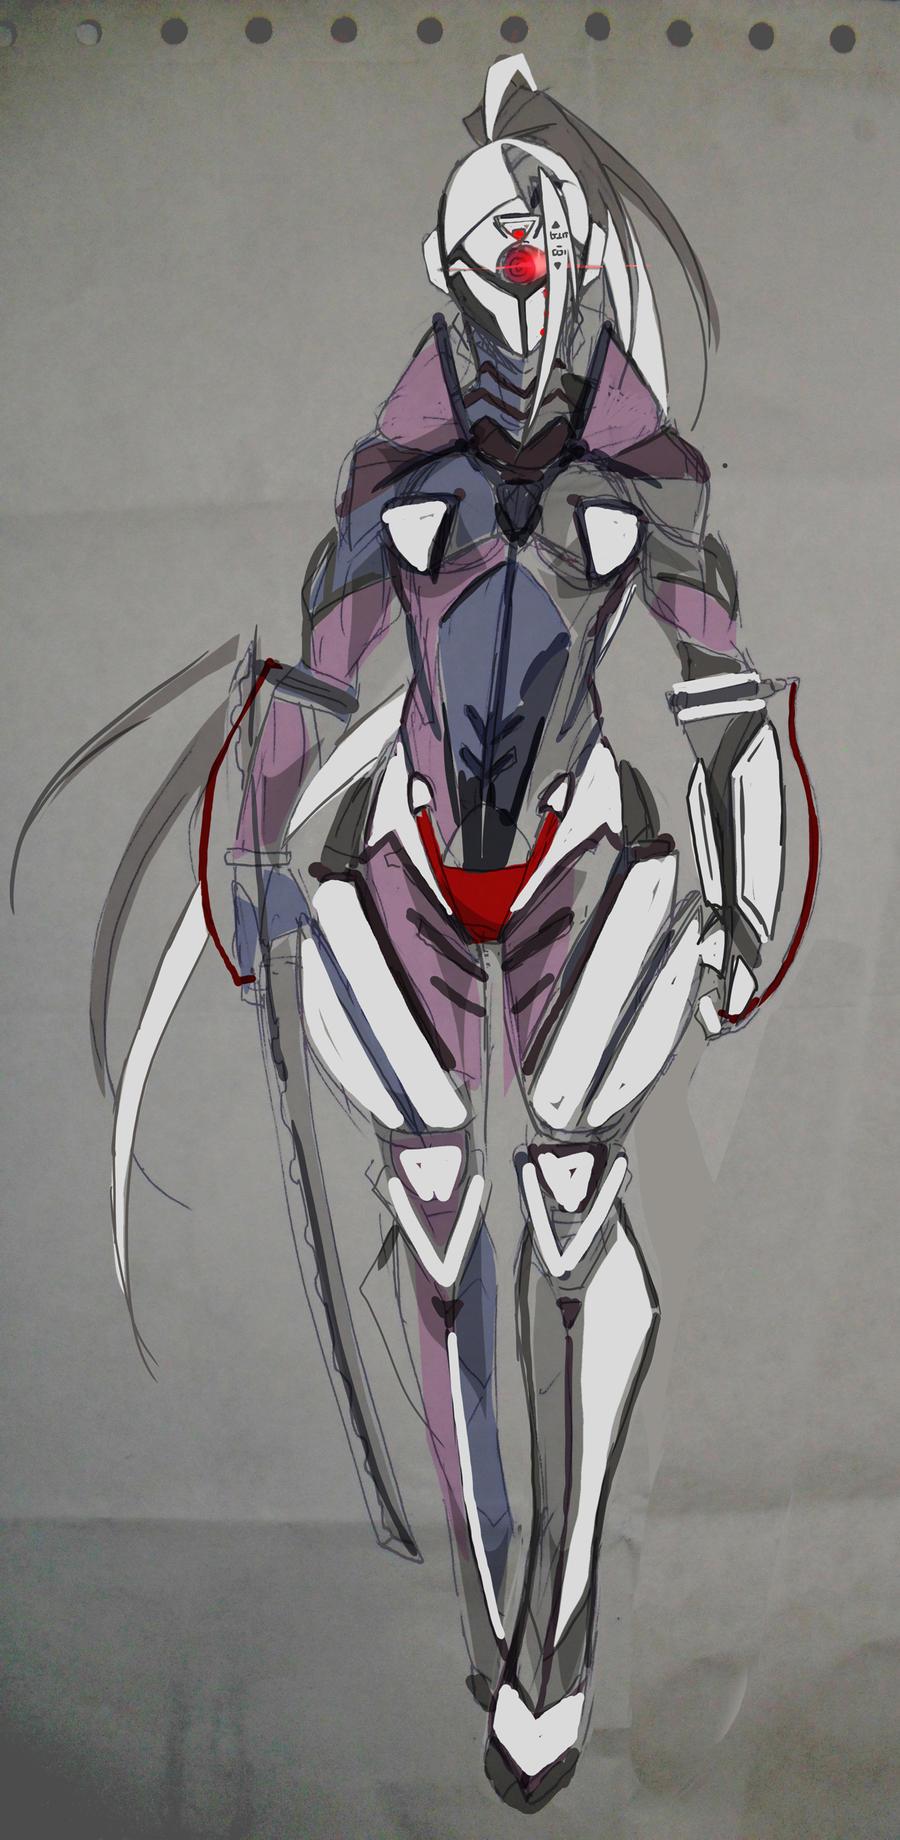 Cyborg Ninja by Agacross on DeviantArt